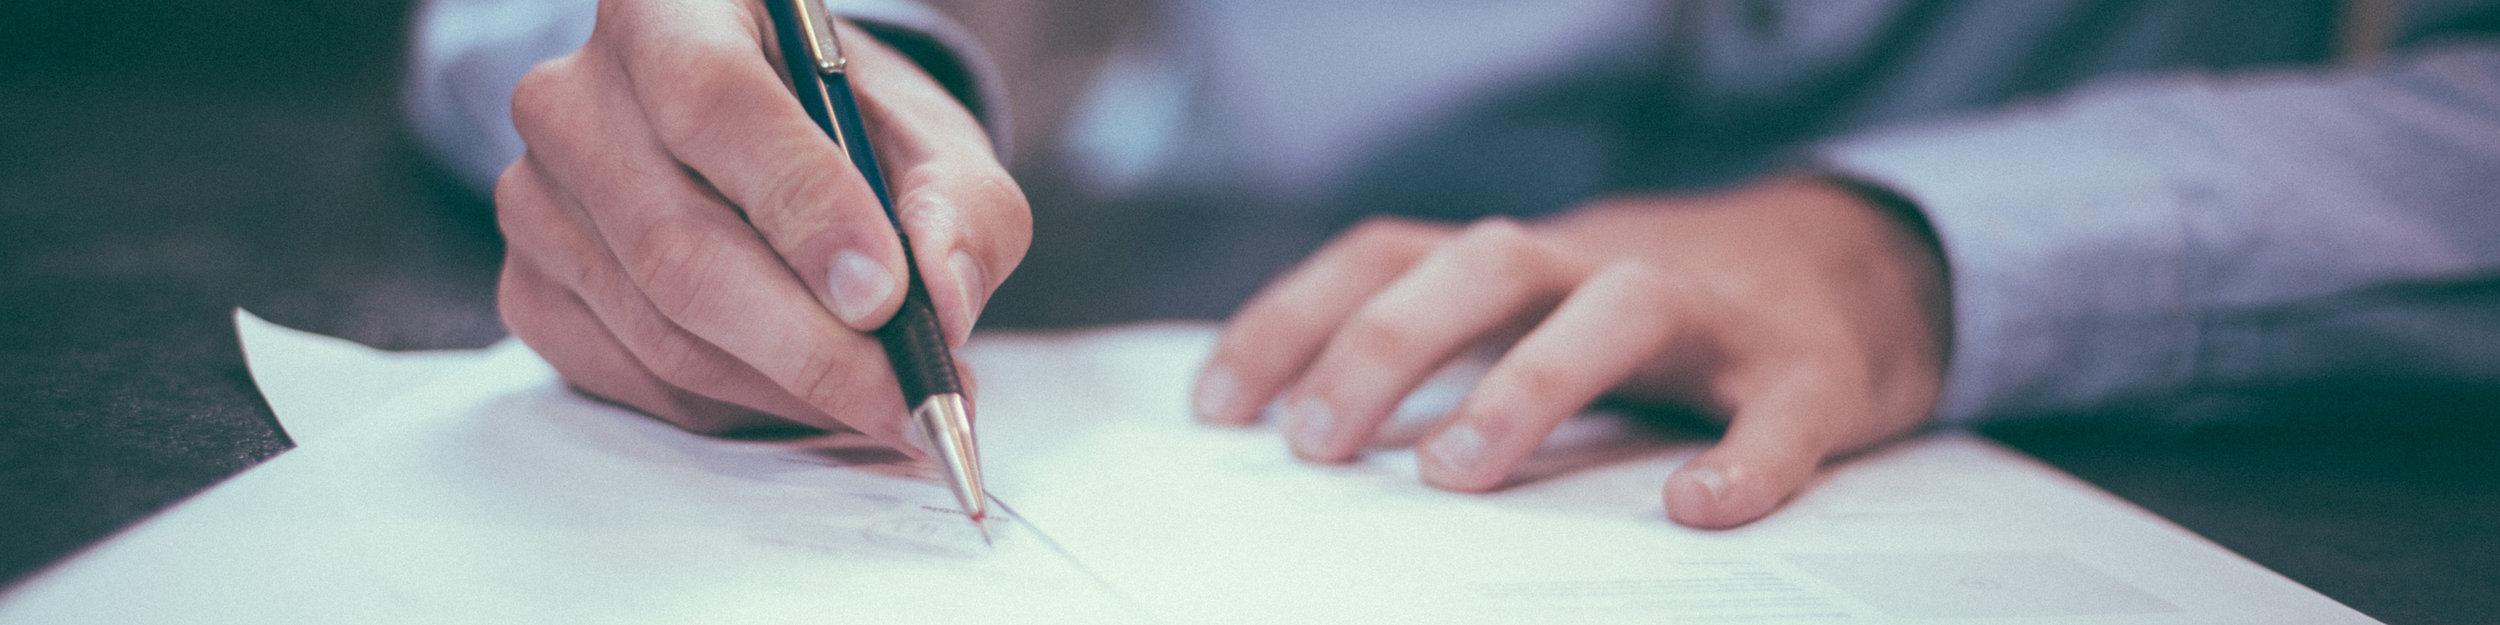 notary-oaths-services-bodnaruk.jpg